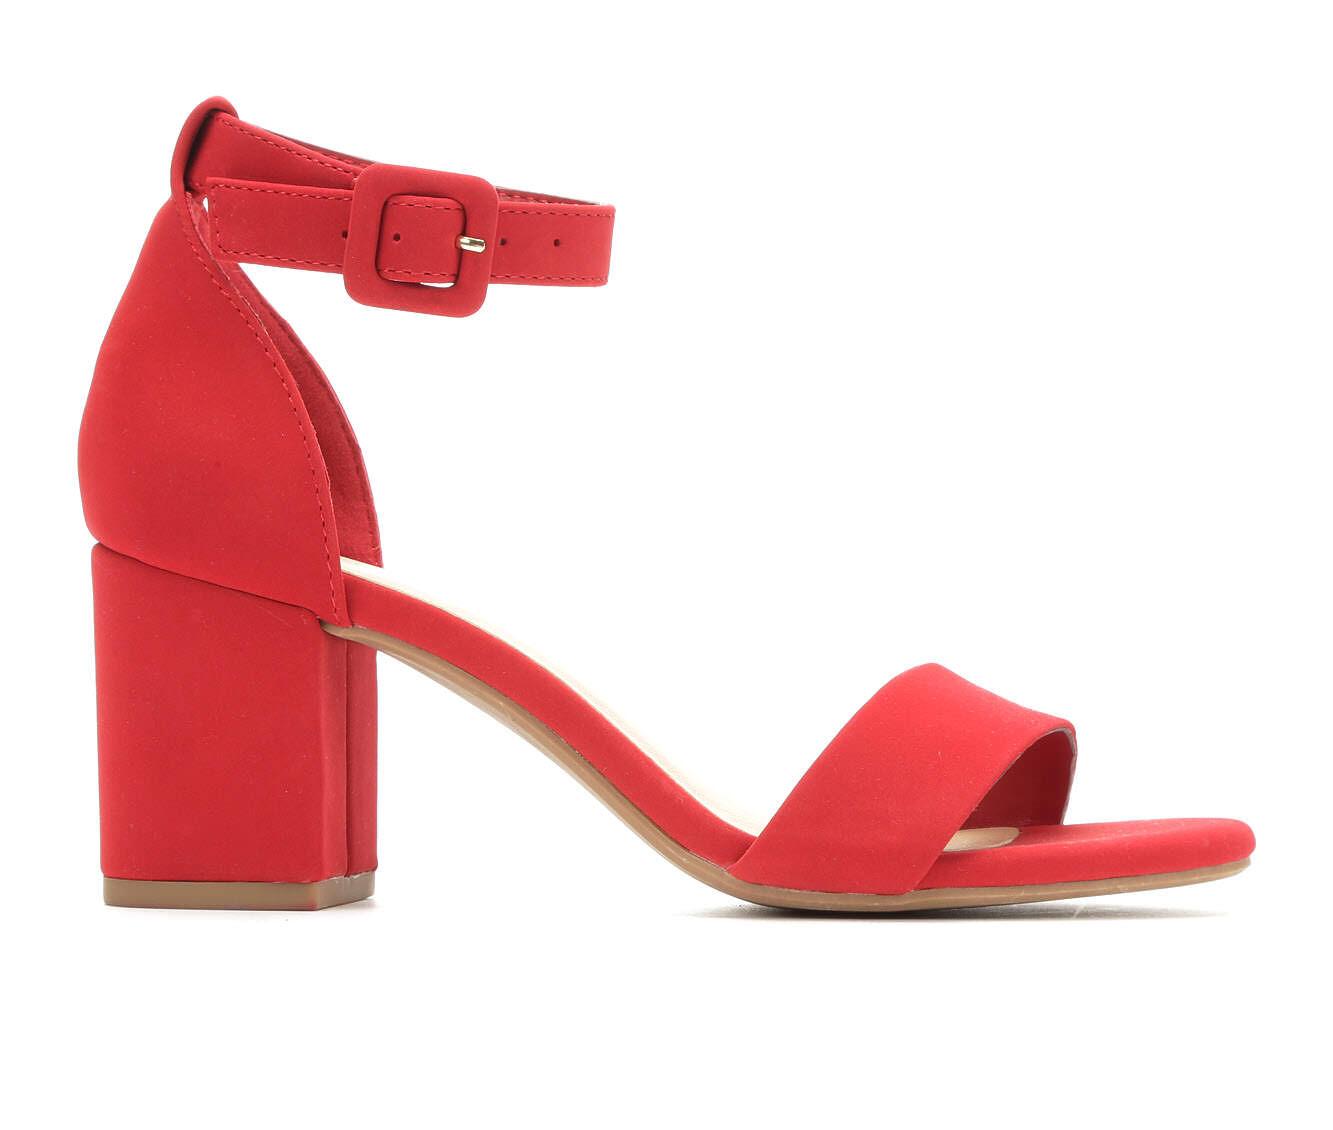 uk shoes_kd6397